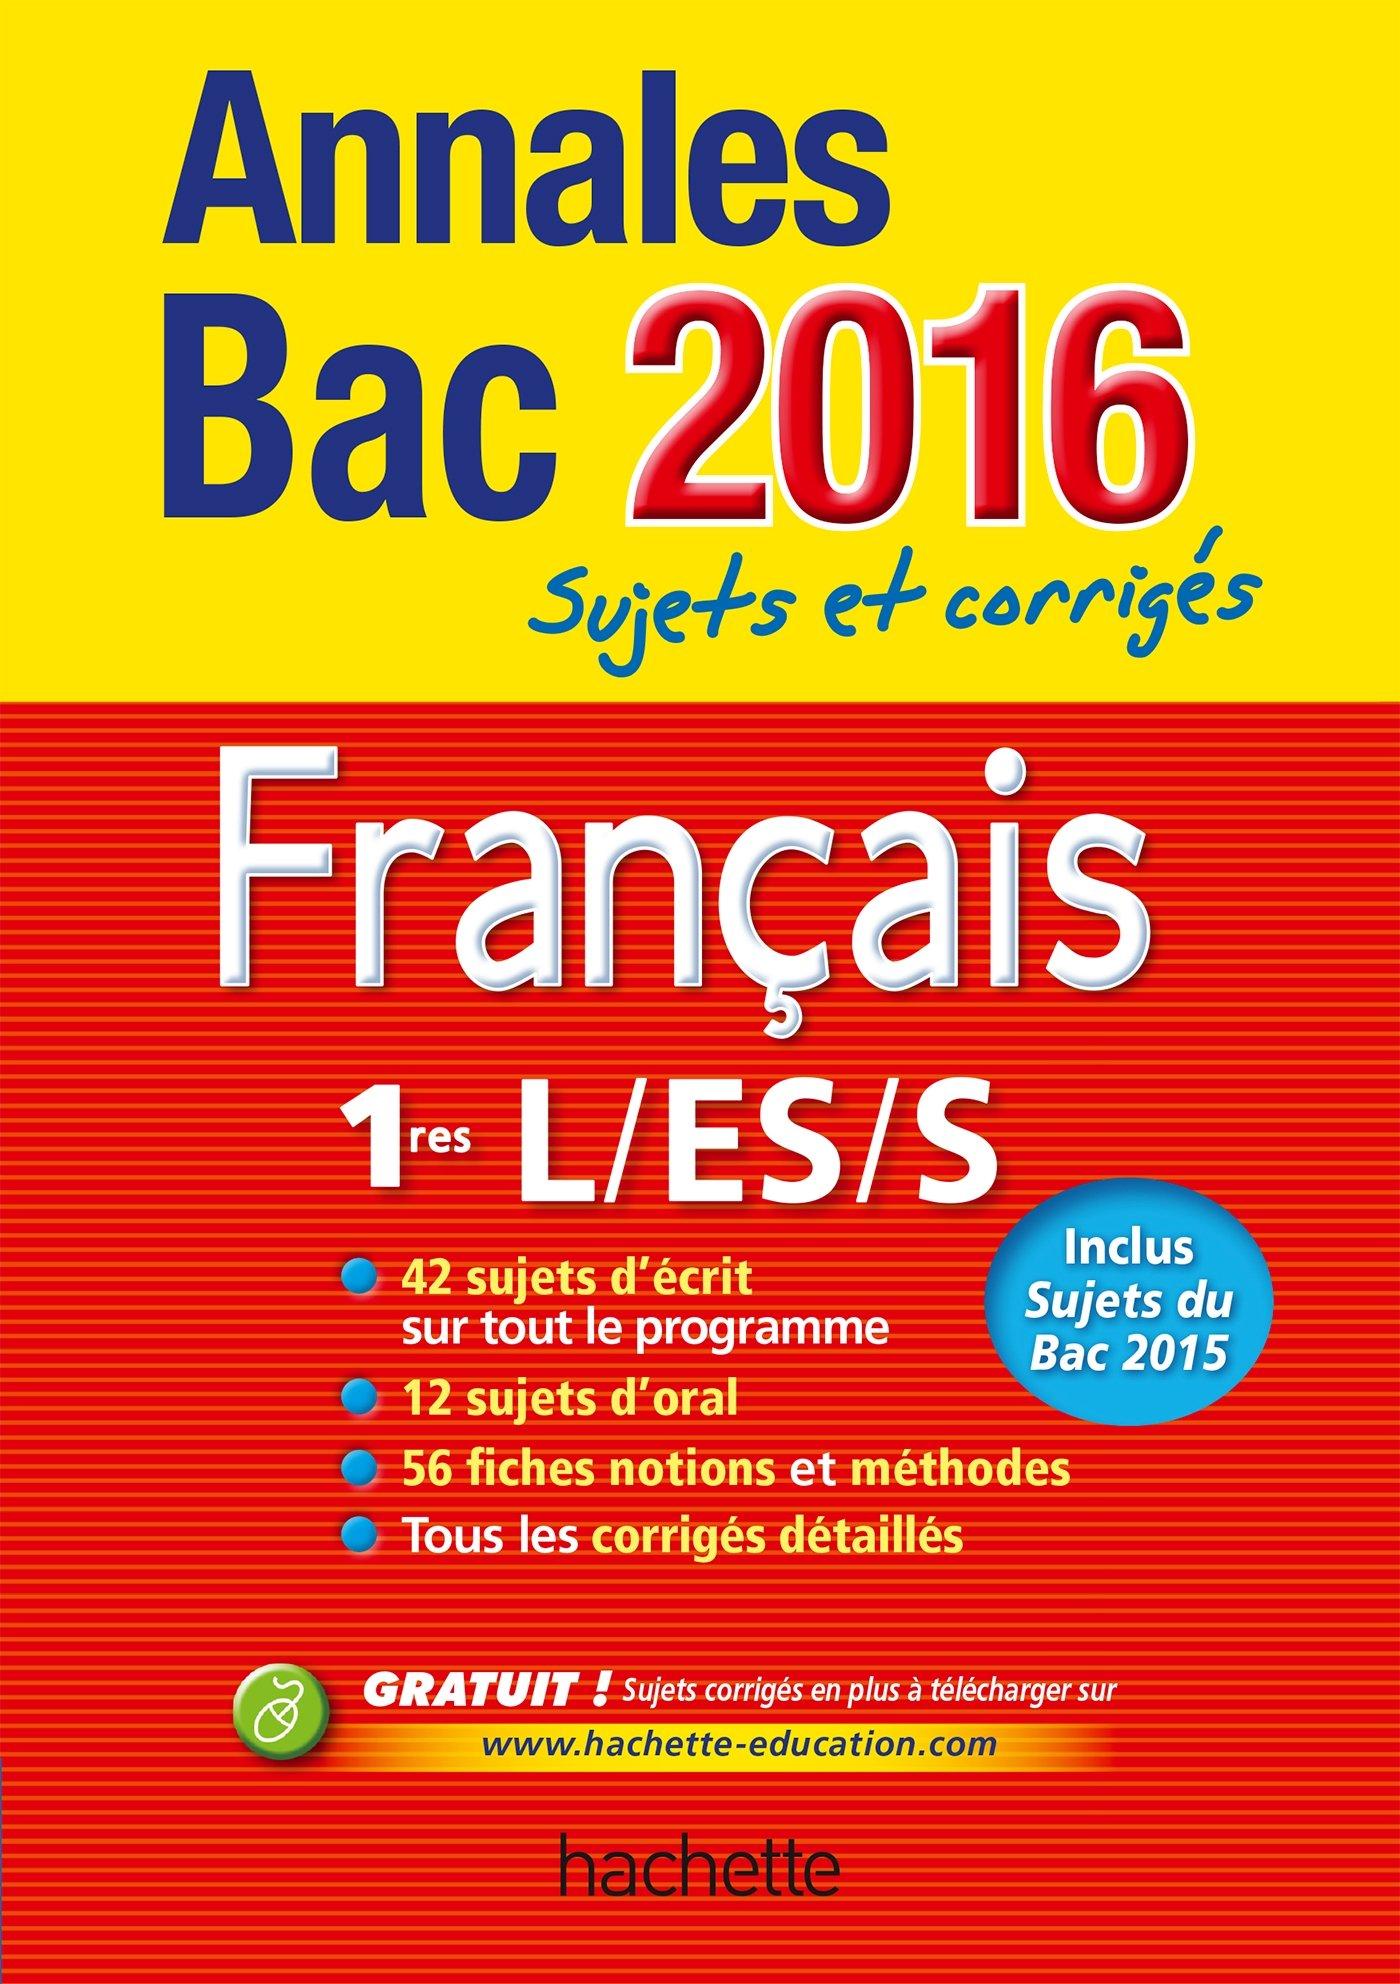 Annales 2016 Français 1Res (Annales du Bac): Amazon.es: Isabelle Lisle (de), Sylvie Beauthier, Éric Le Grandic: Libros en idiomas extranjeros